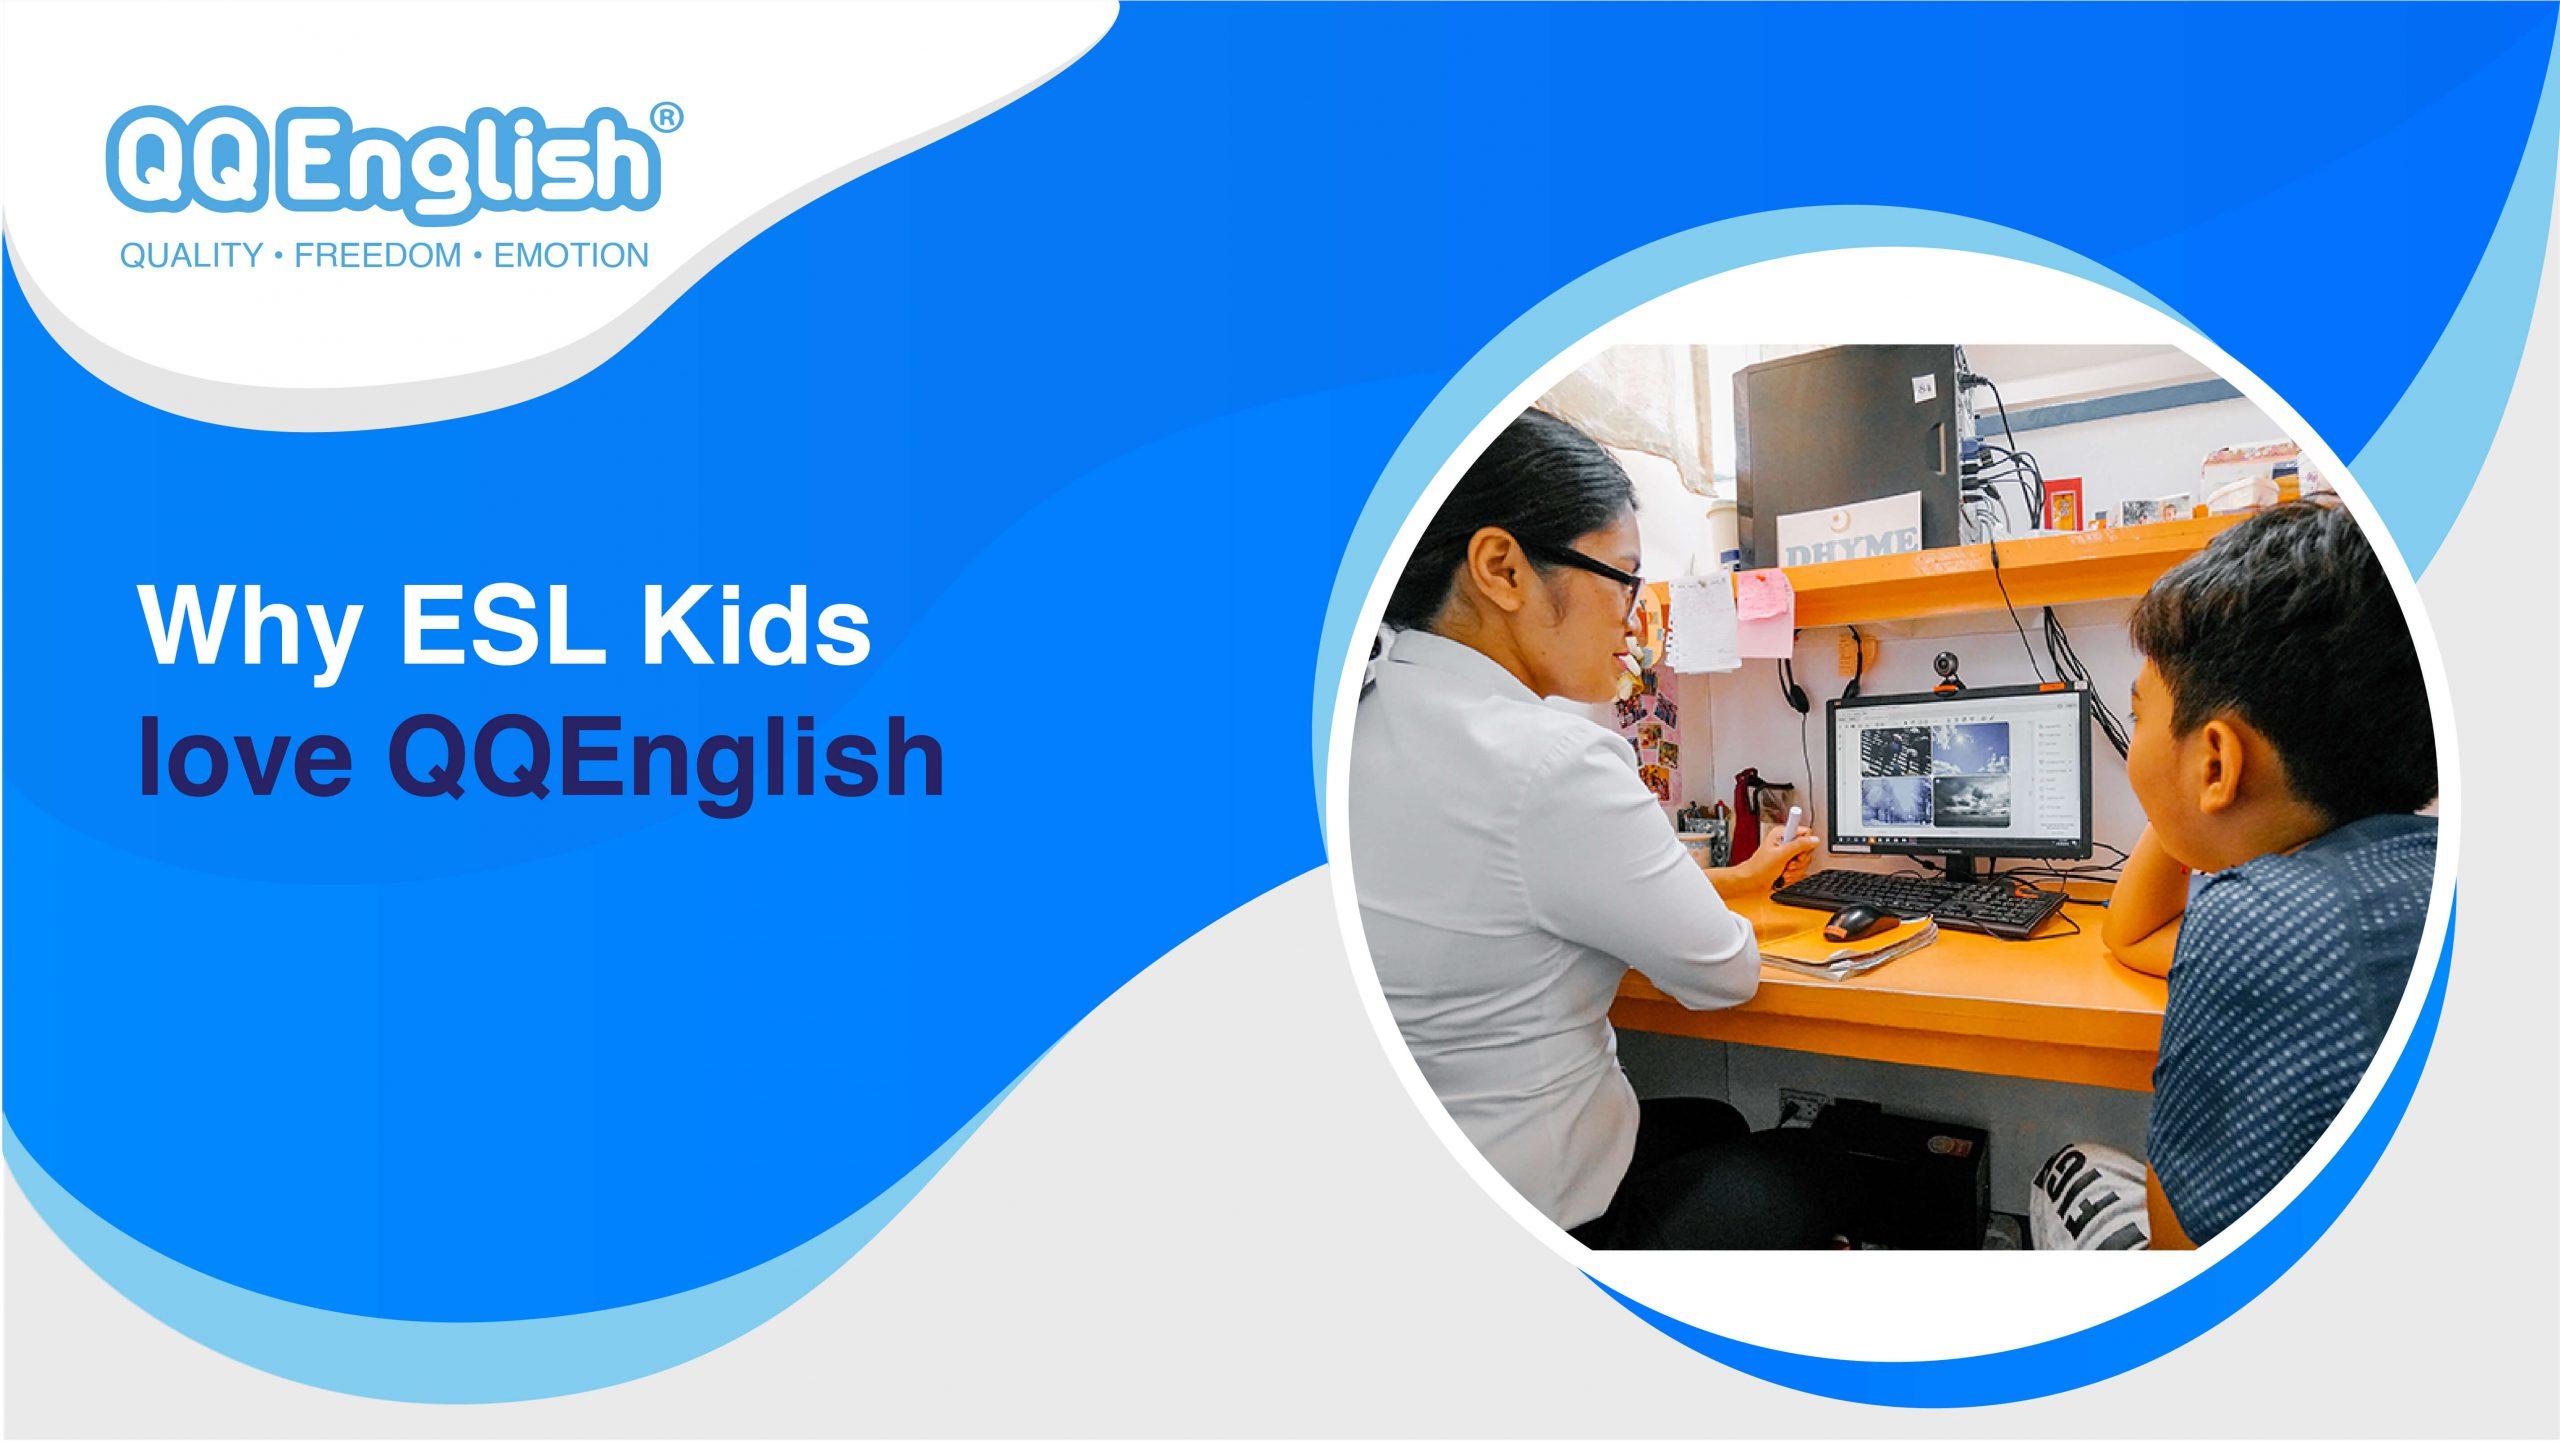 Why ESL Kids love QQEnglish